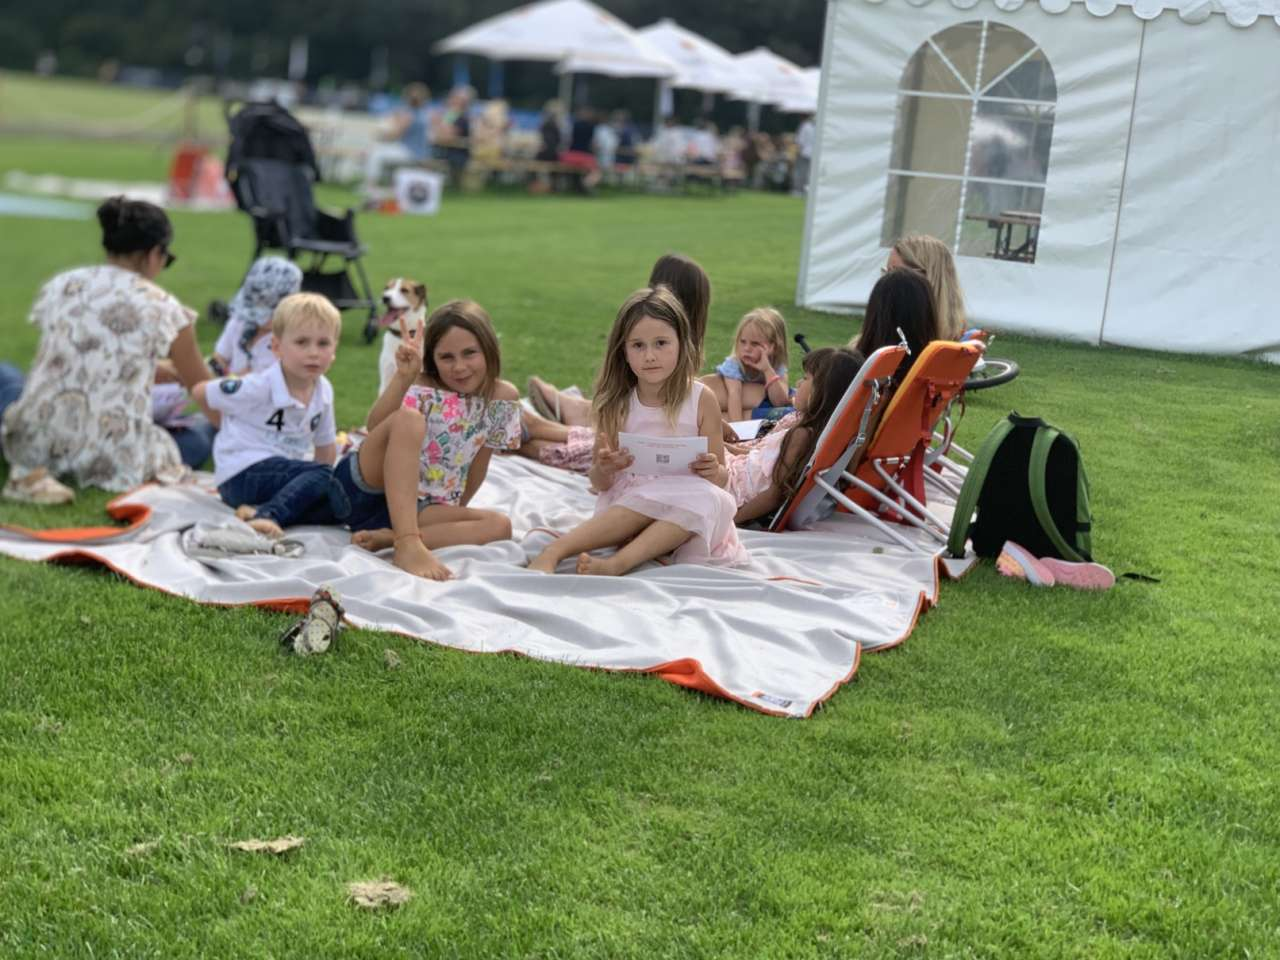 Suba Picnic-Makers Familienfrühstück auf der Picknickdecke